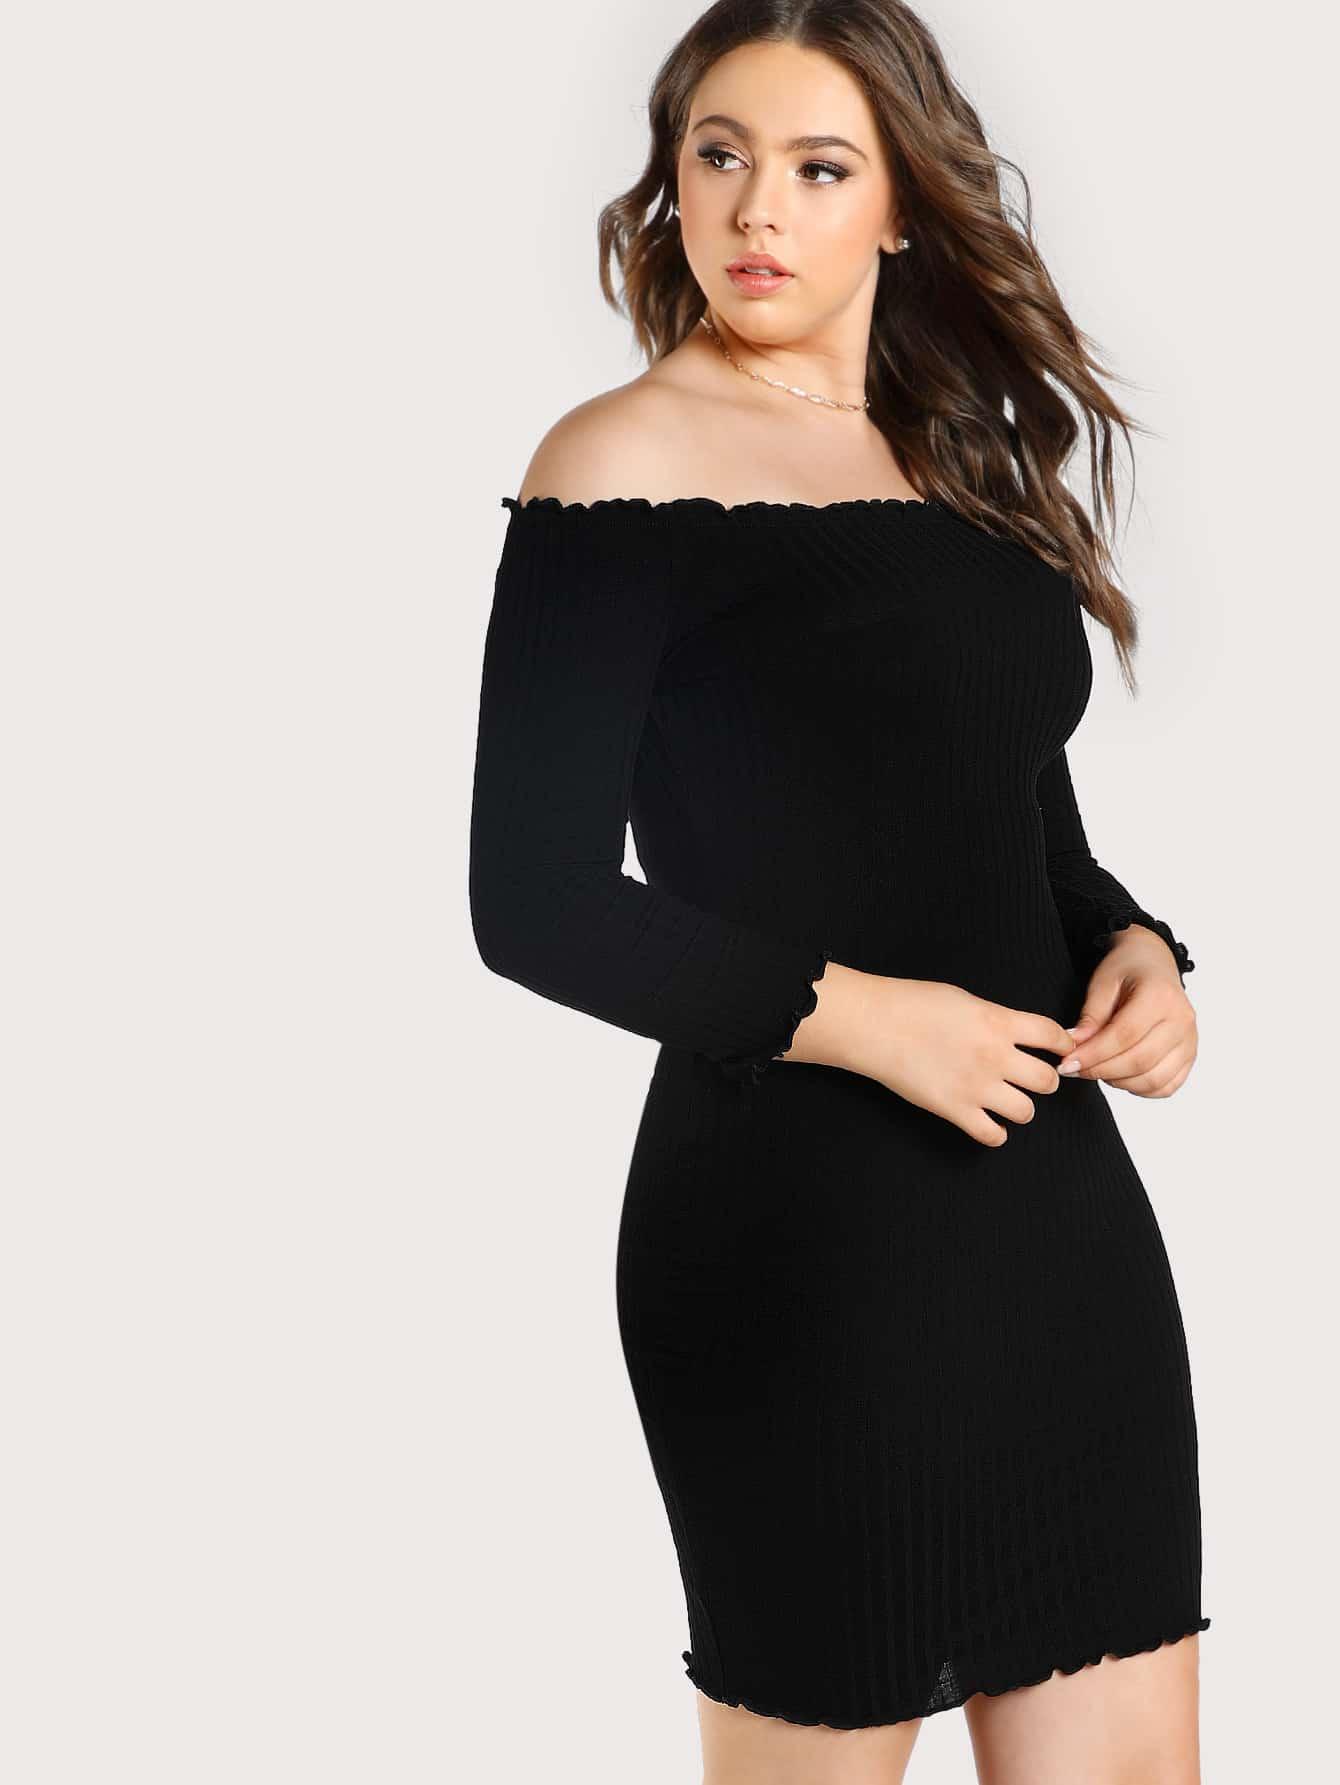 Rib Knit Off Shoulder Dress mmc-bld1398-blk